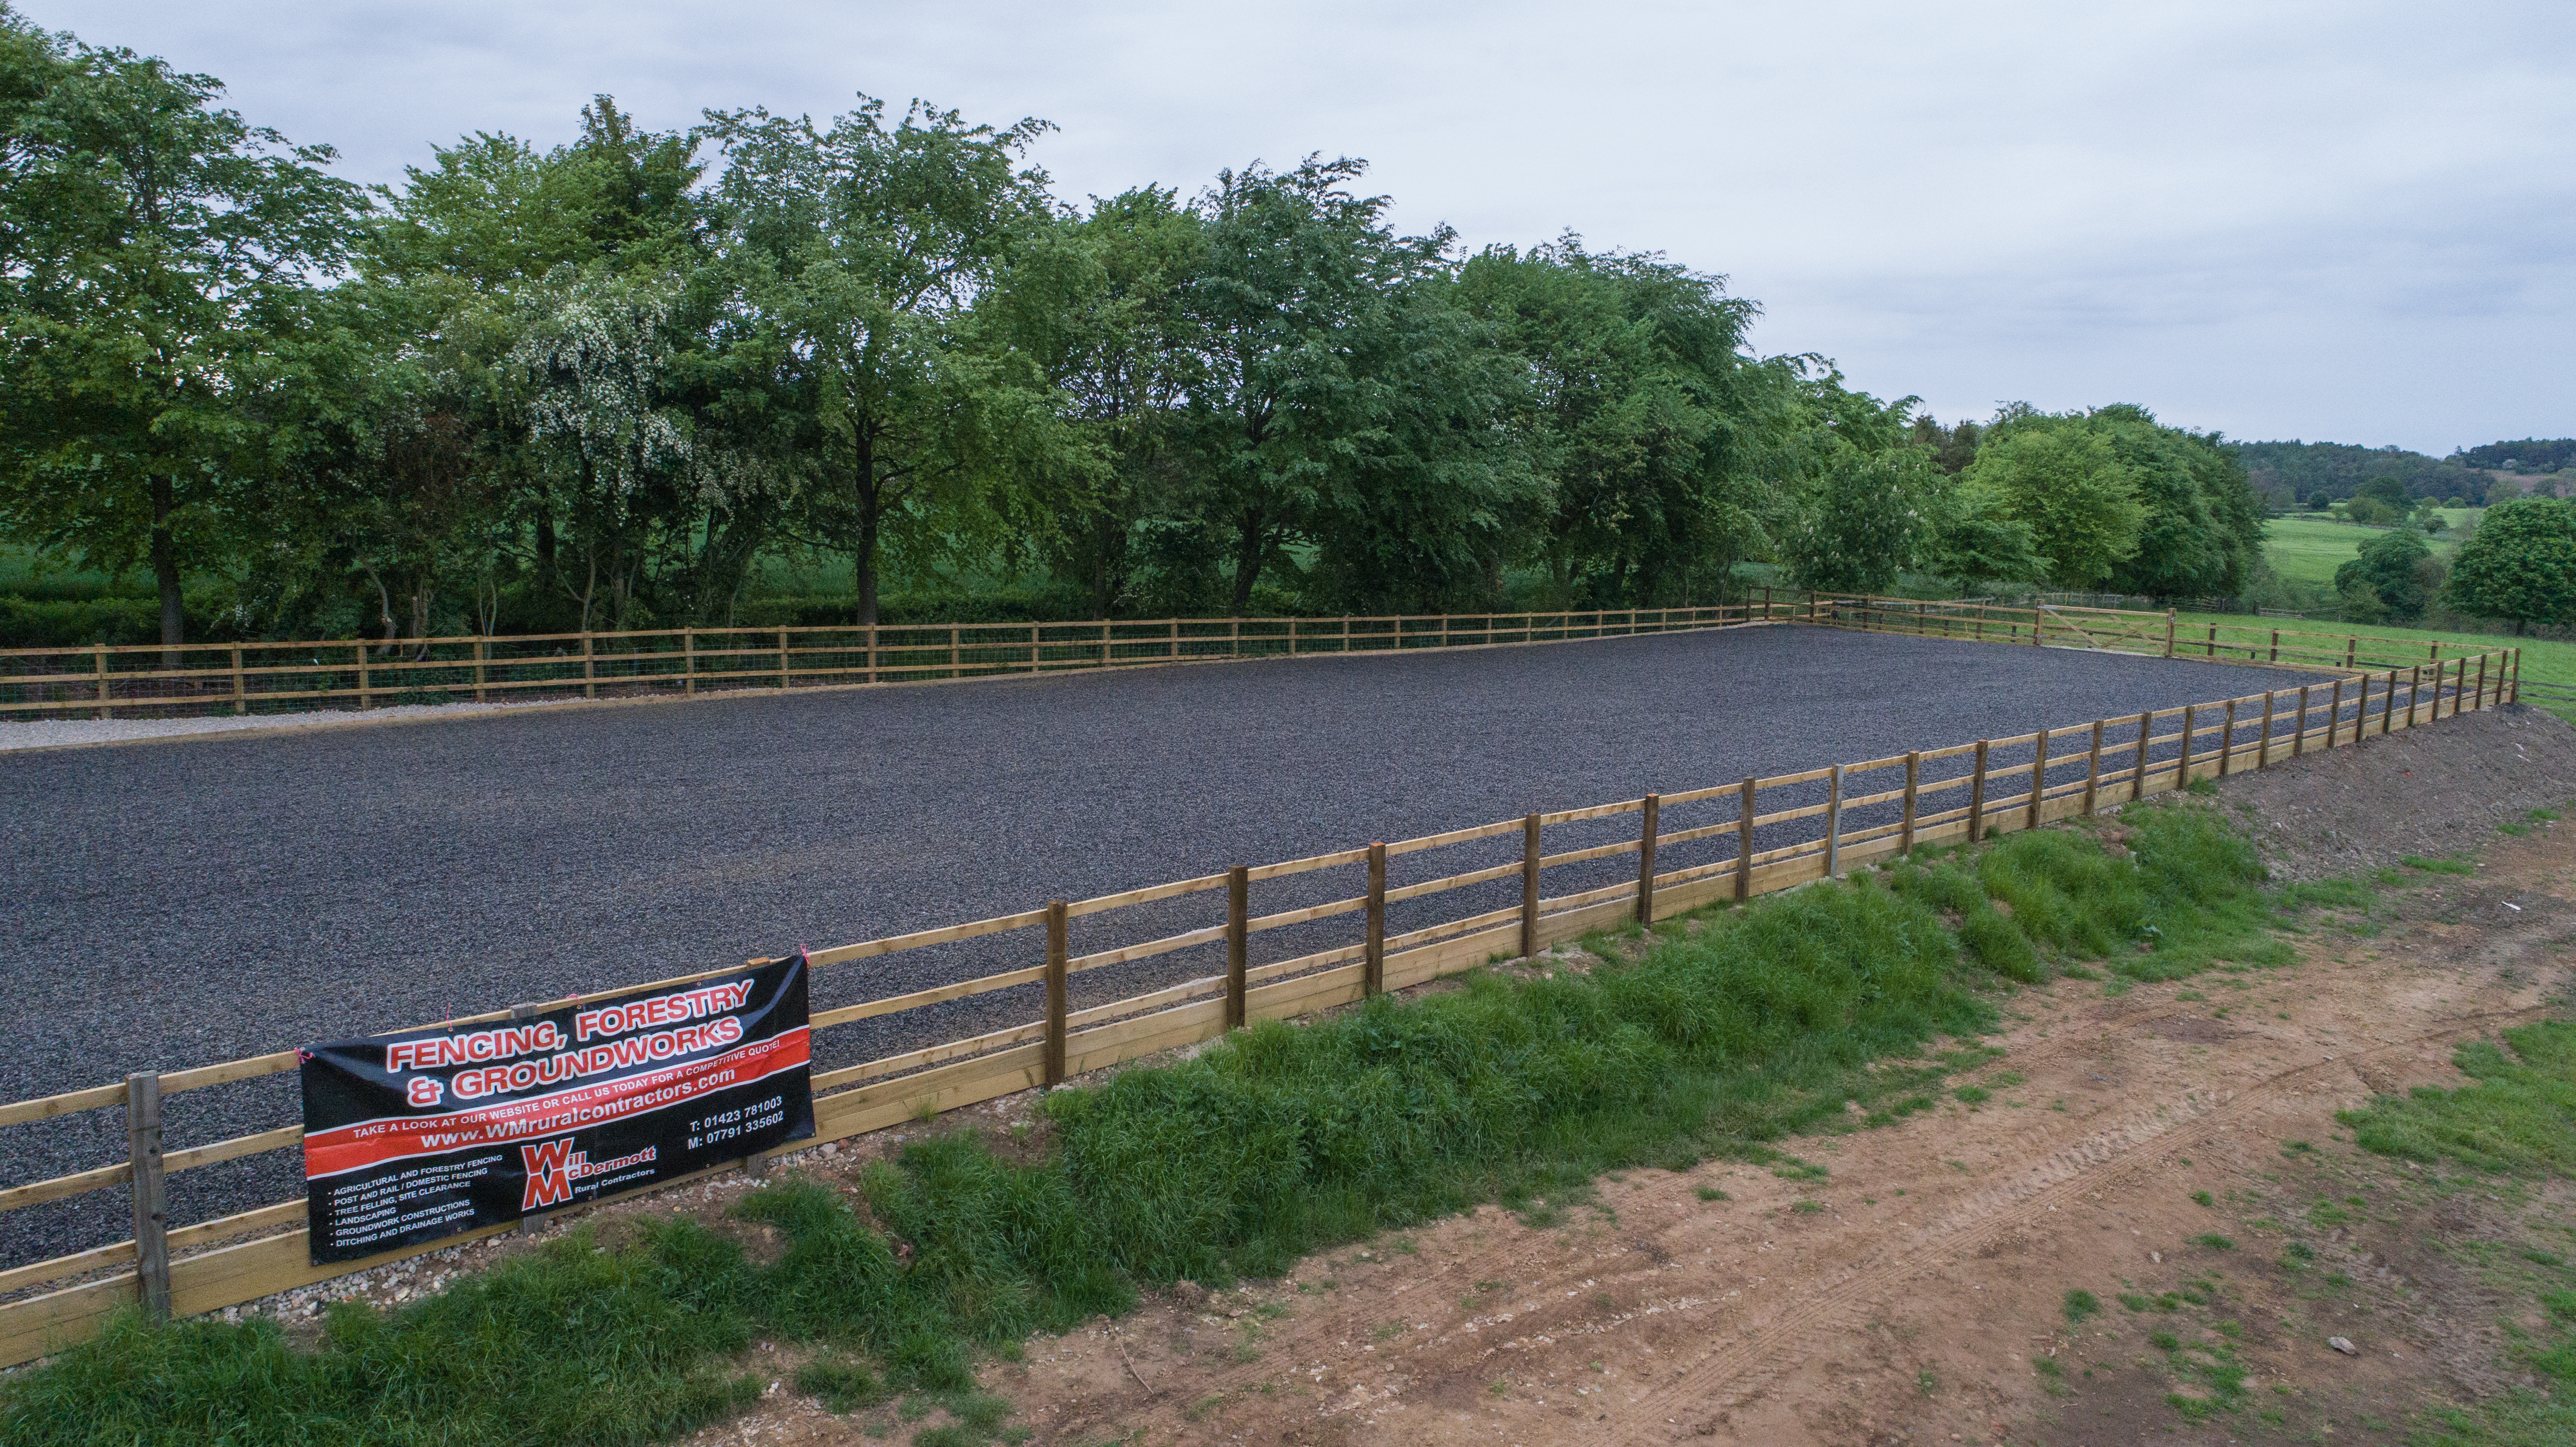 Equestrian arena Ripon